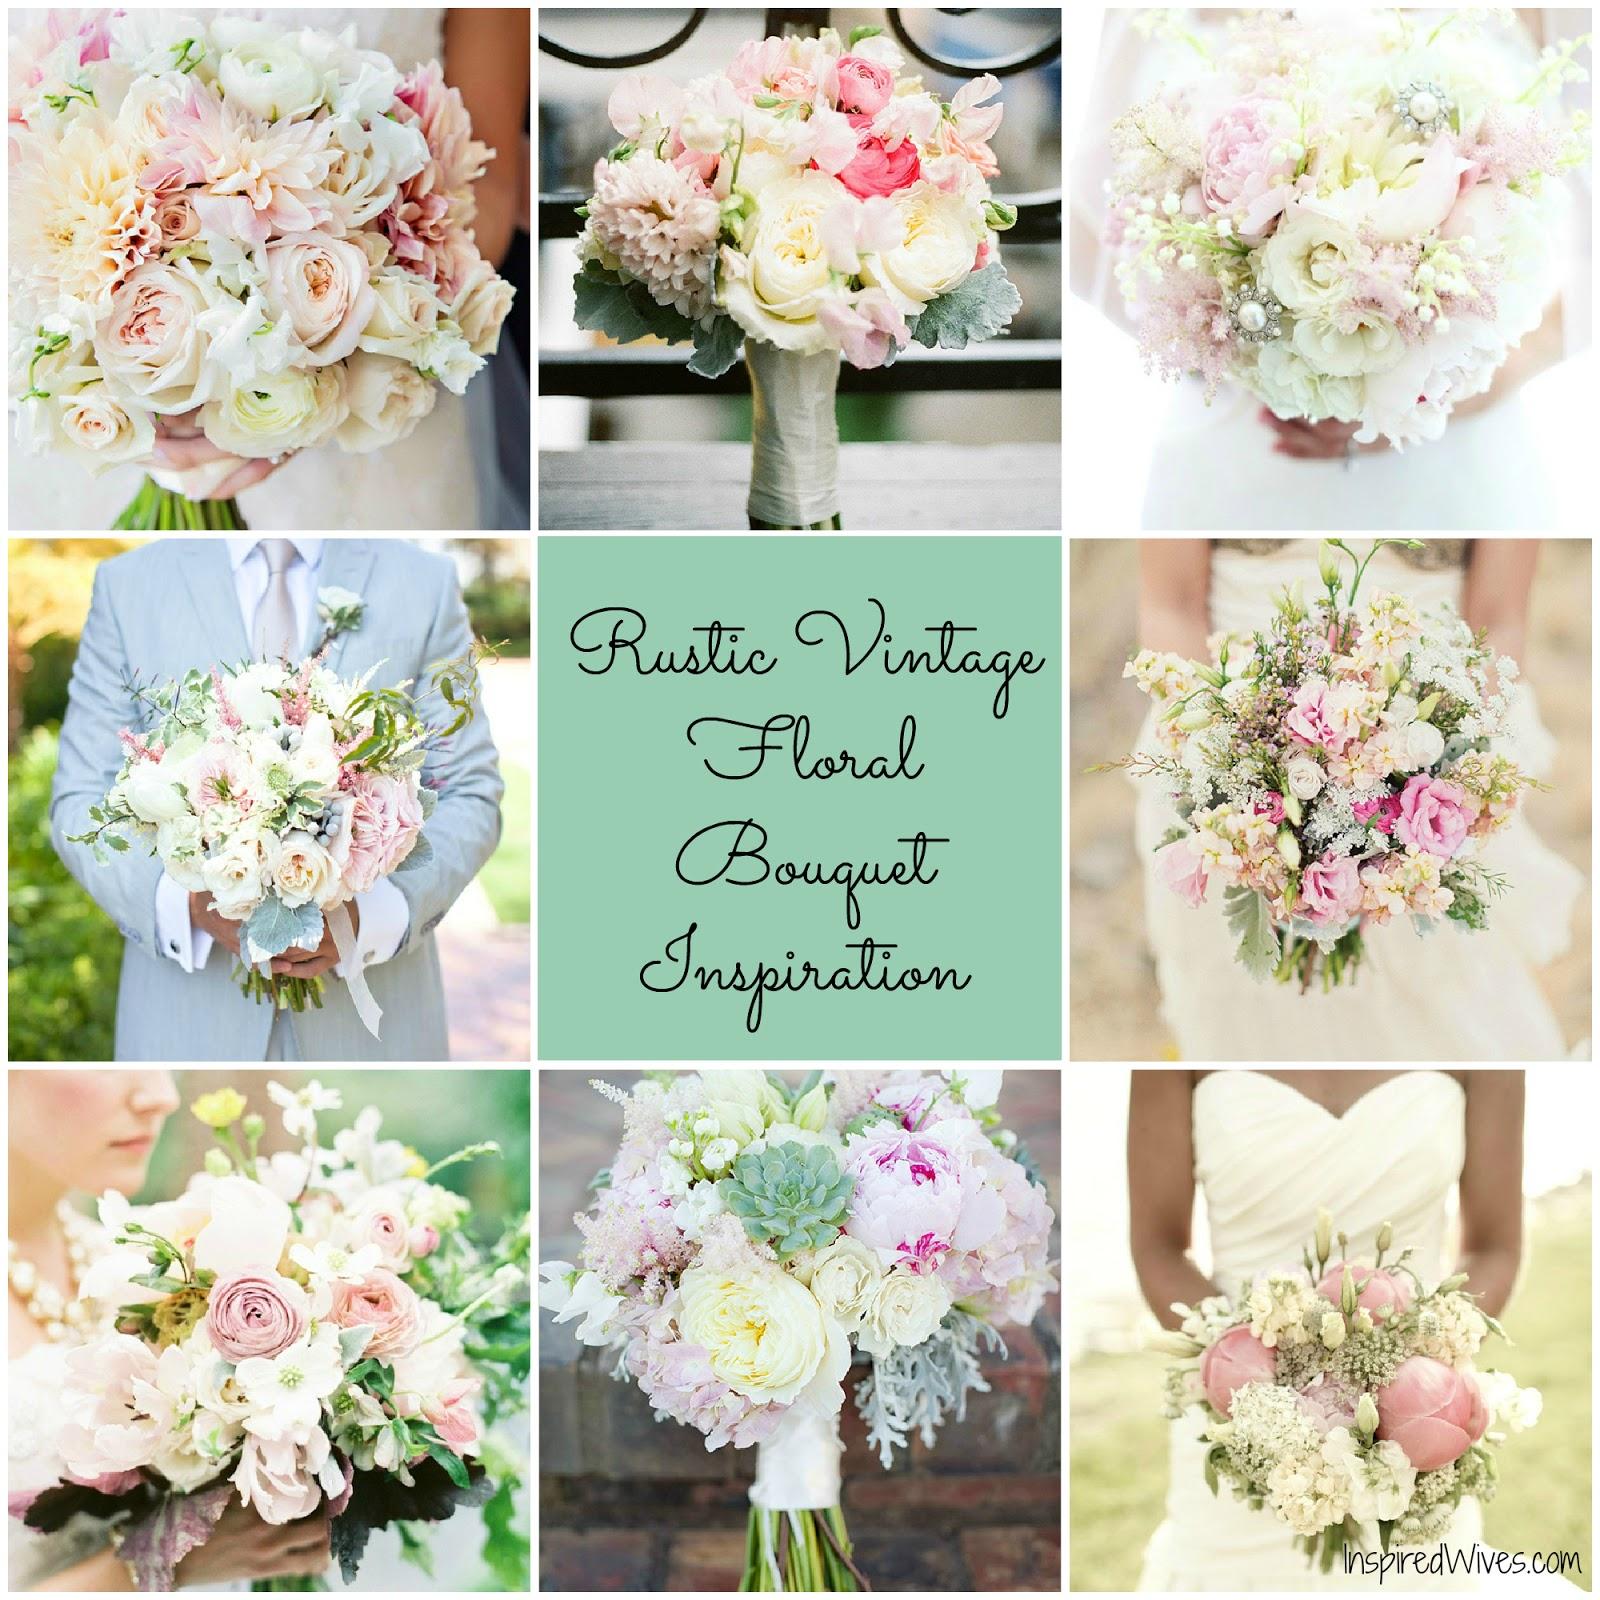 Vintage Flower Arrangements For Wedding: Inspired I Dos: Discussing A Rustic Vintage Inspired